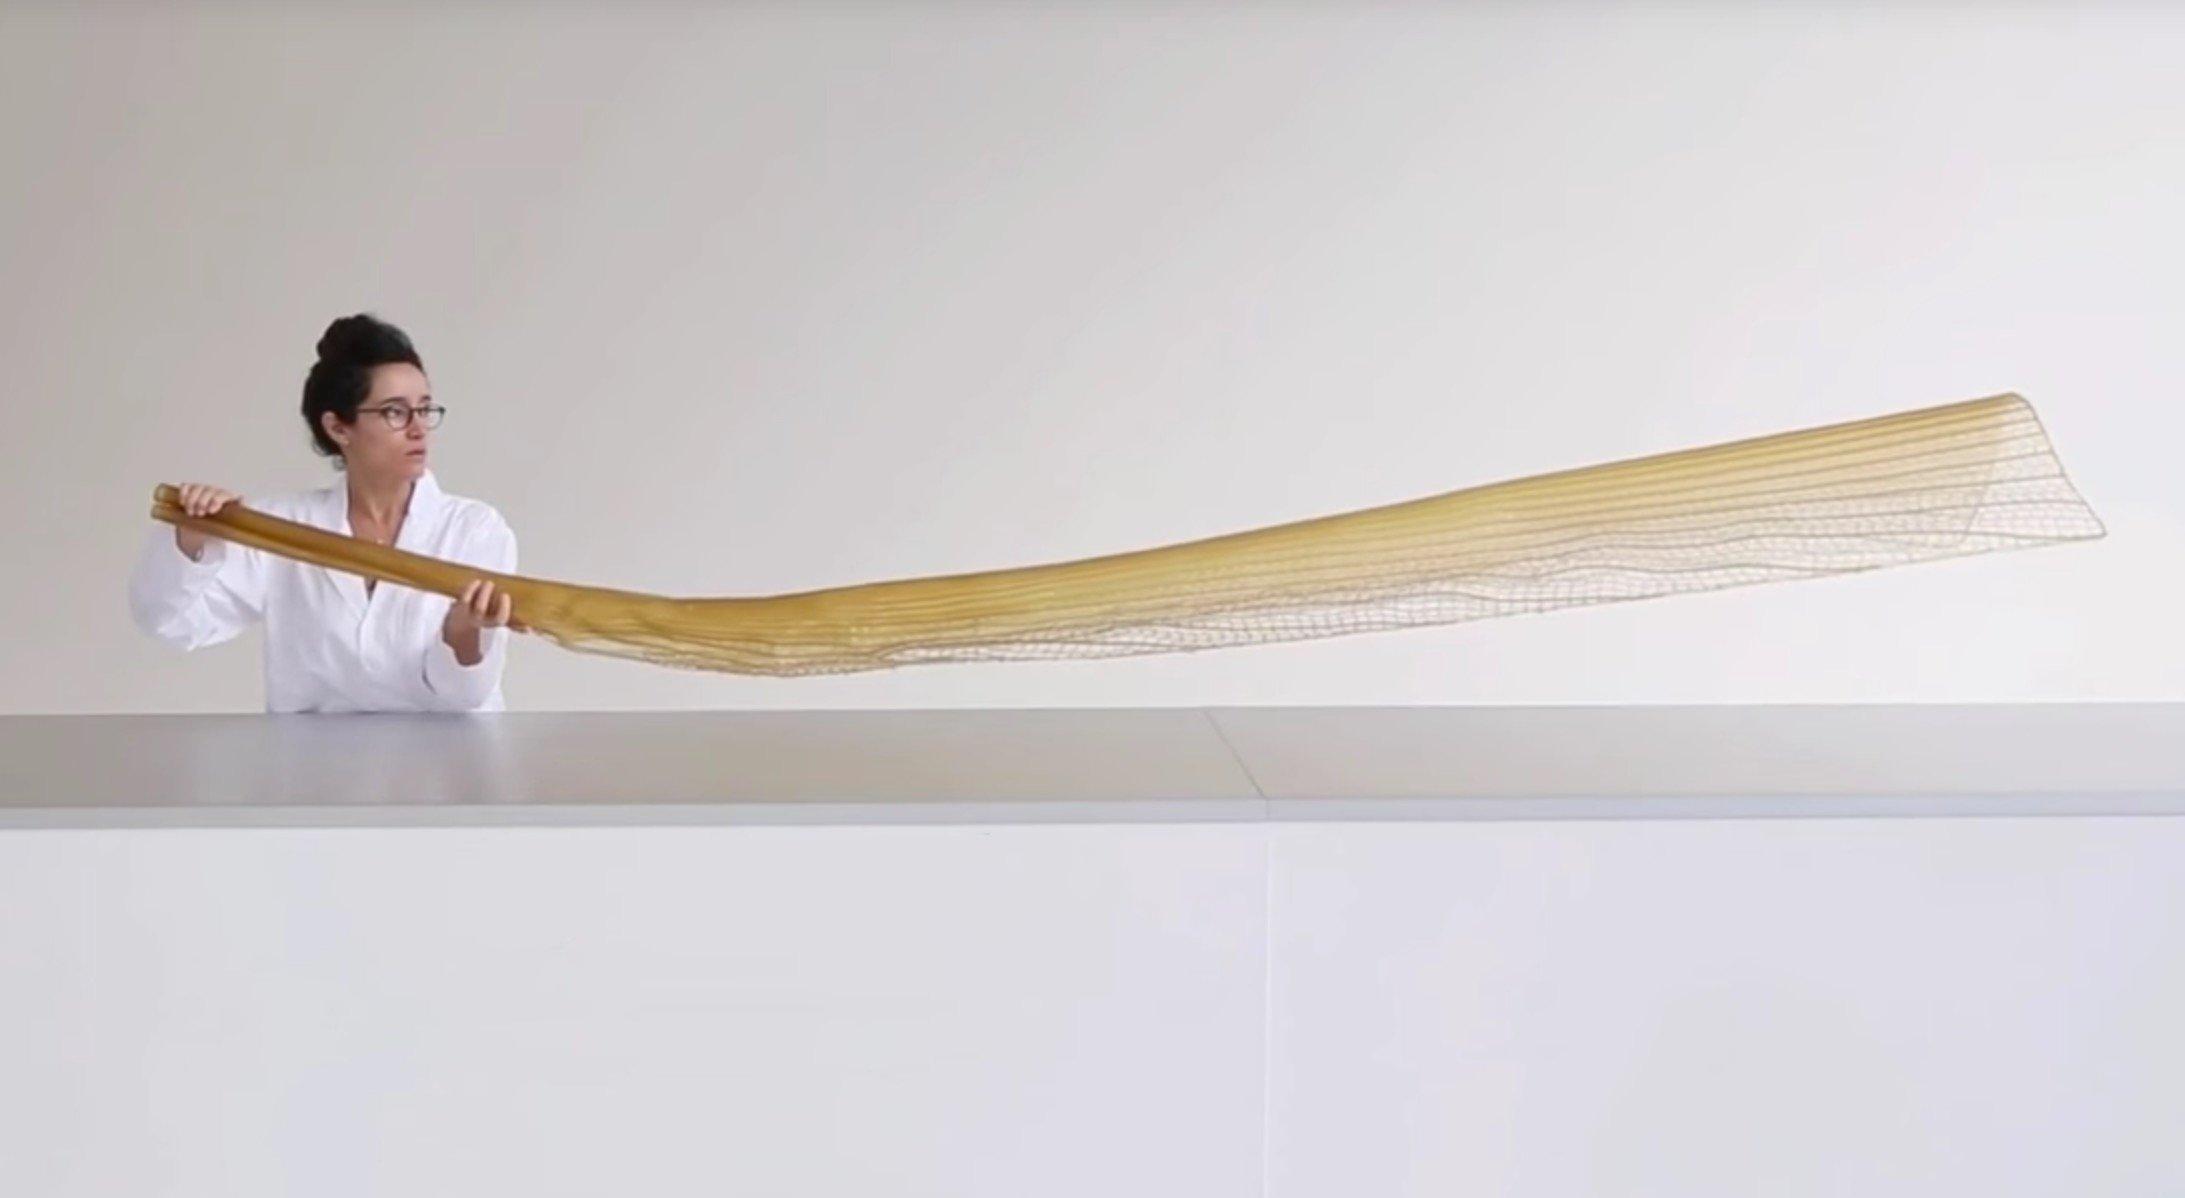 A massive 3D print based on an organic design